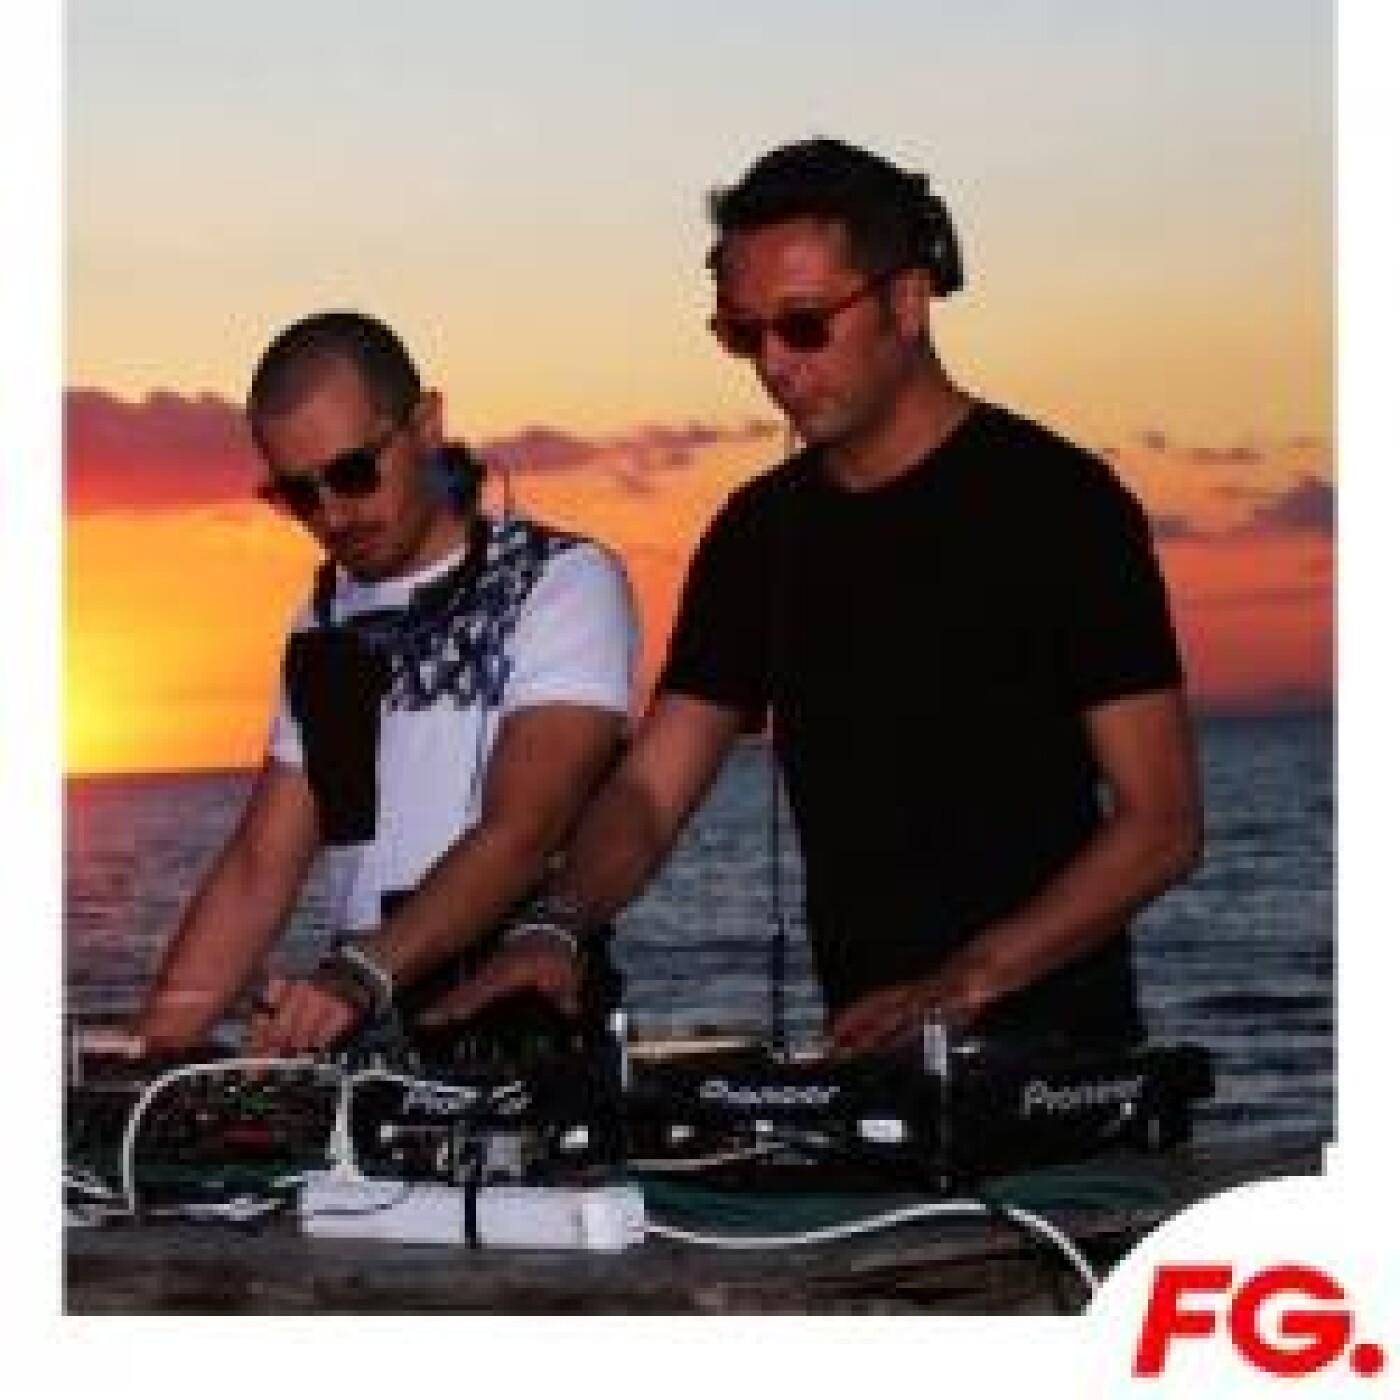 CLUB FG : ALAIA & GALLO